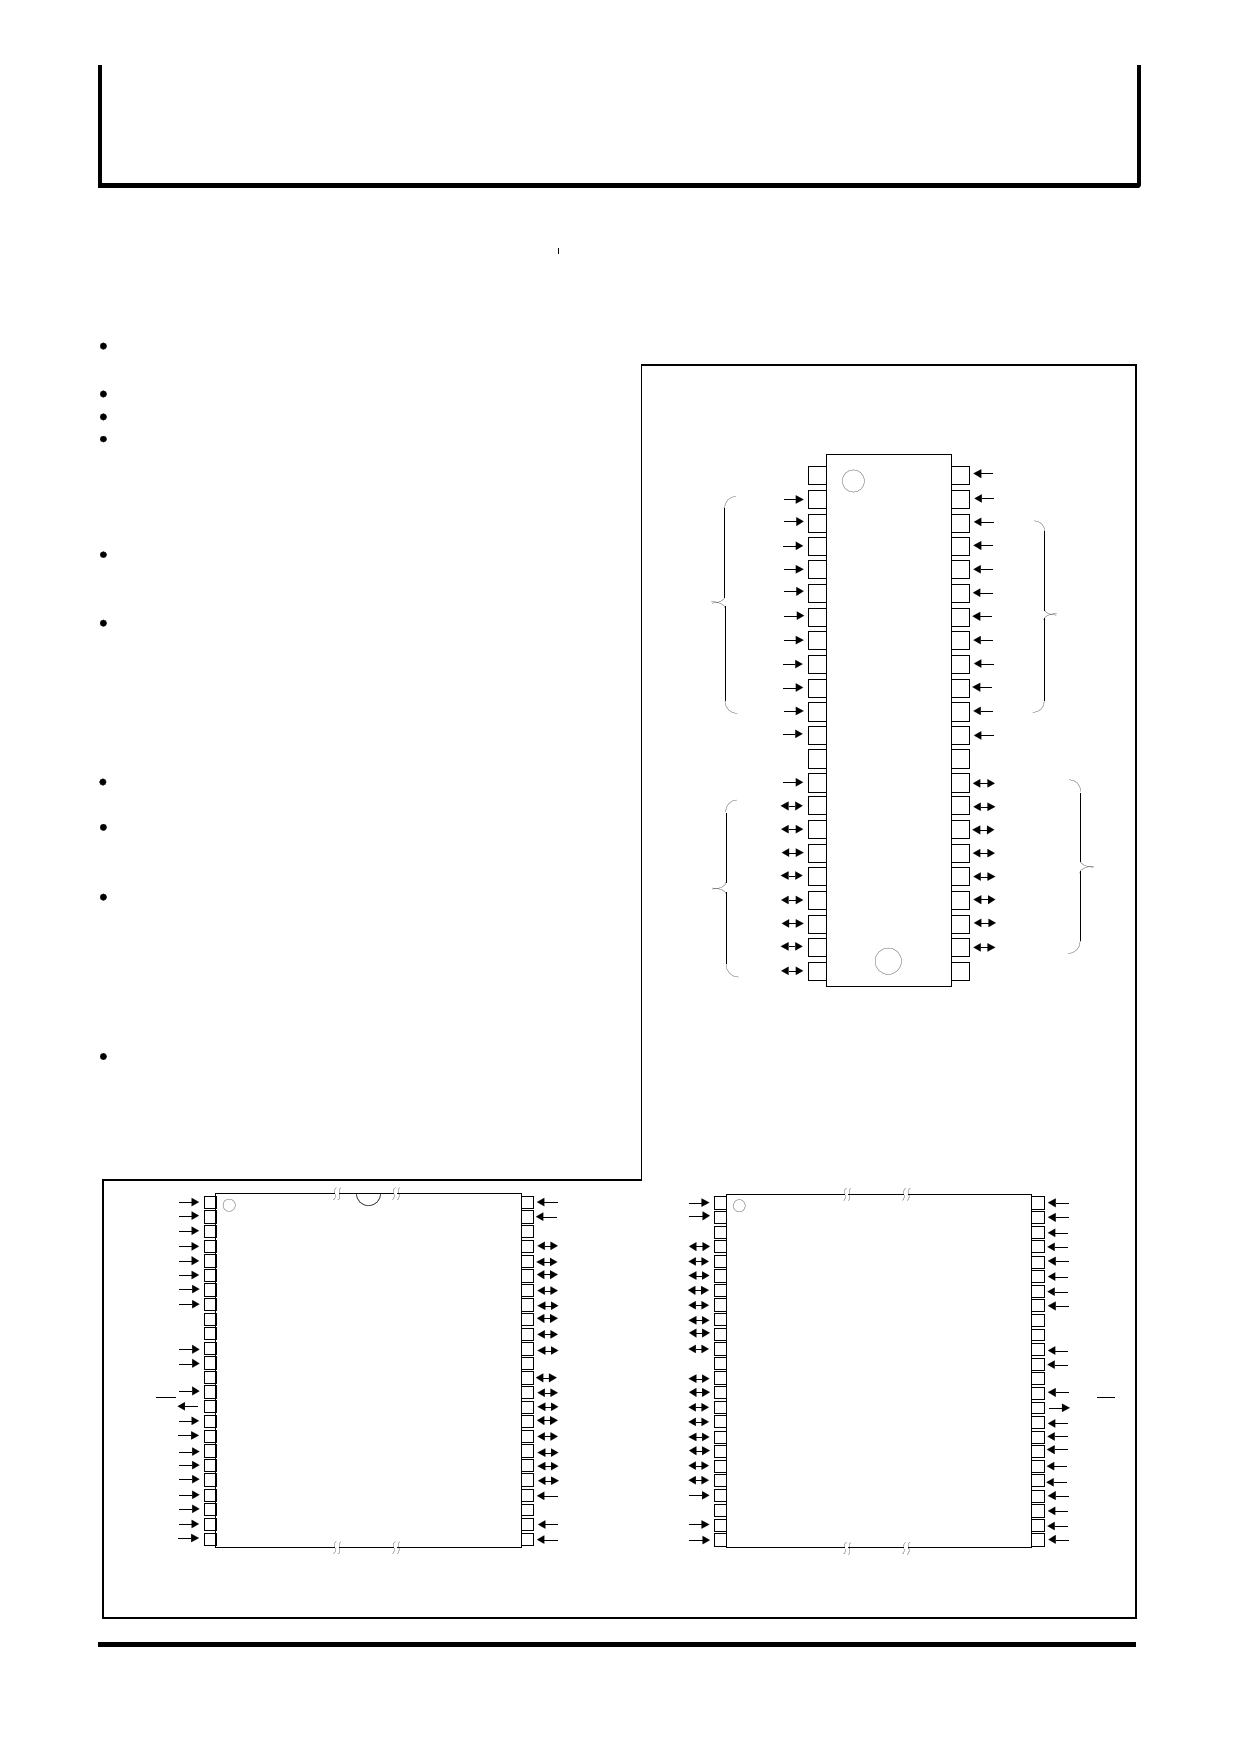 M5M29FB800RV-10 datasheet pinout pdf